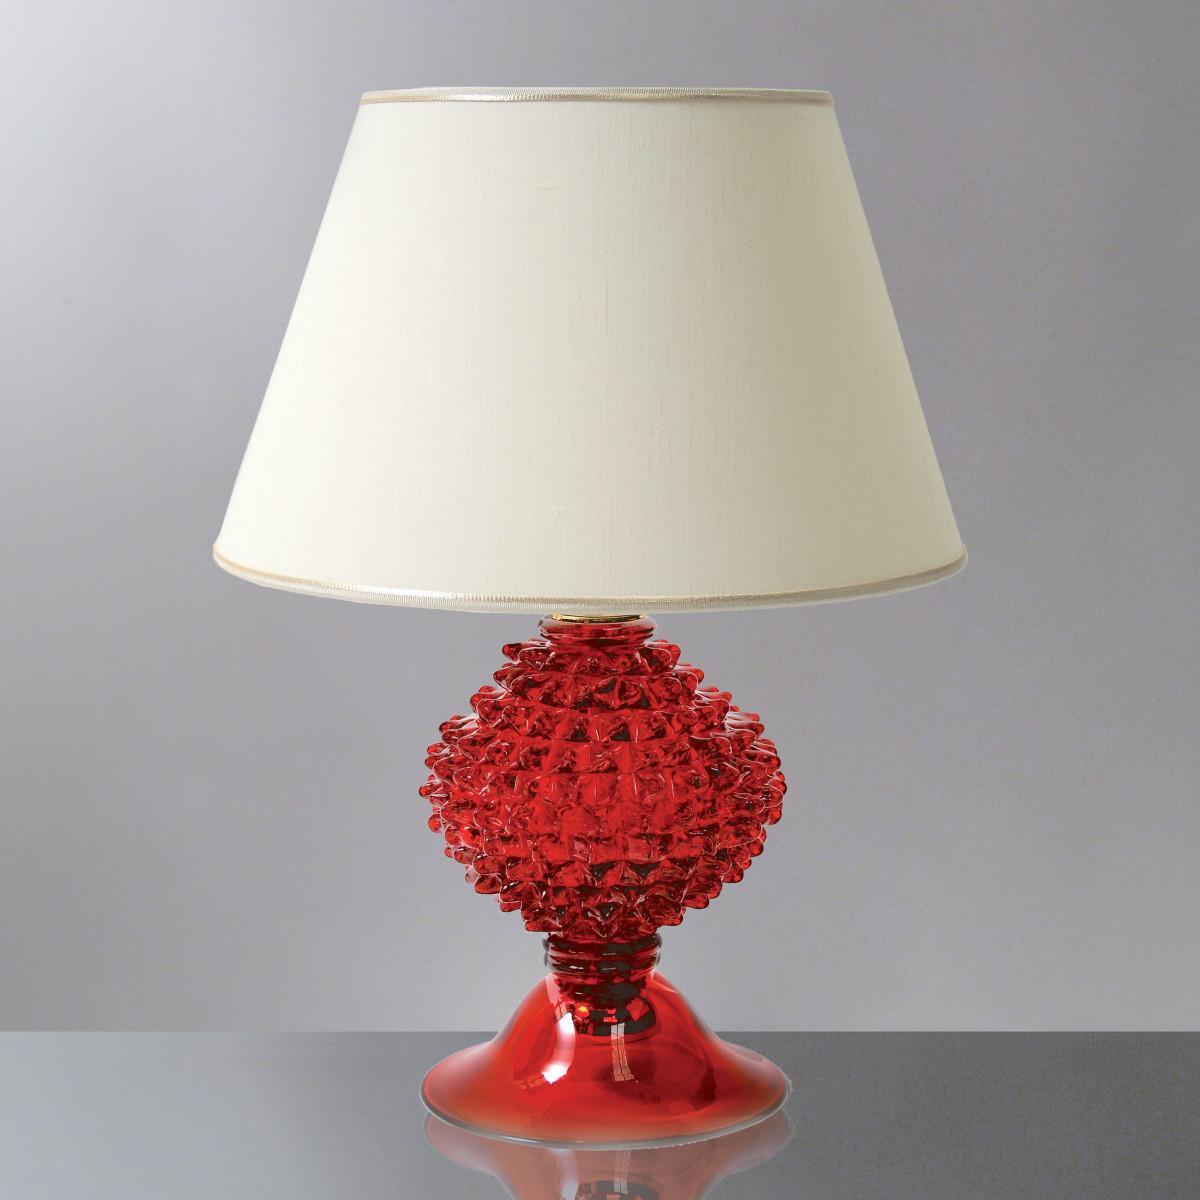 """Maia"" lampara de sobremesa de Murano"